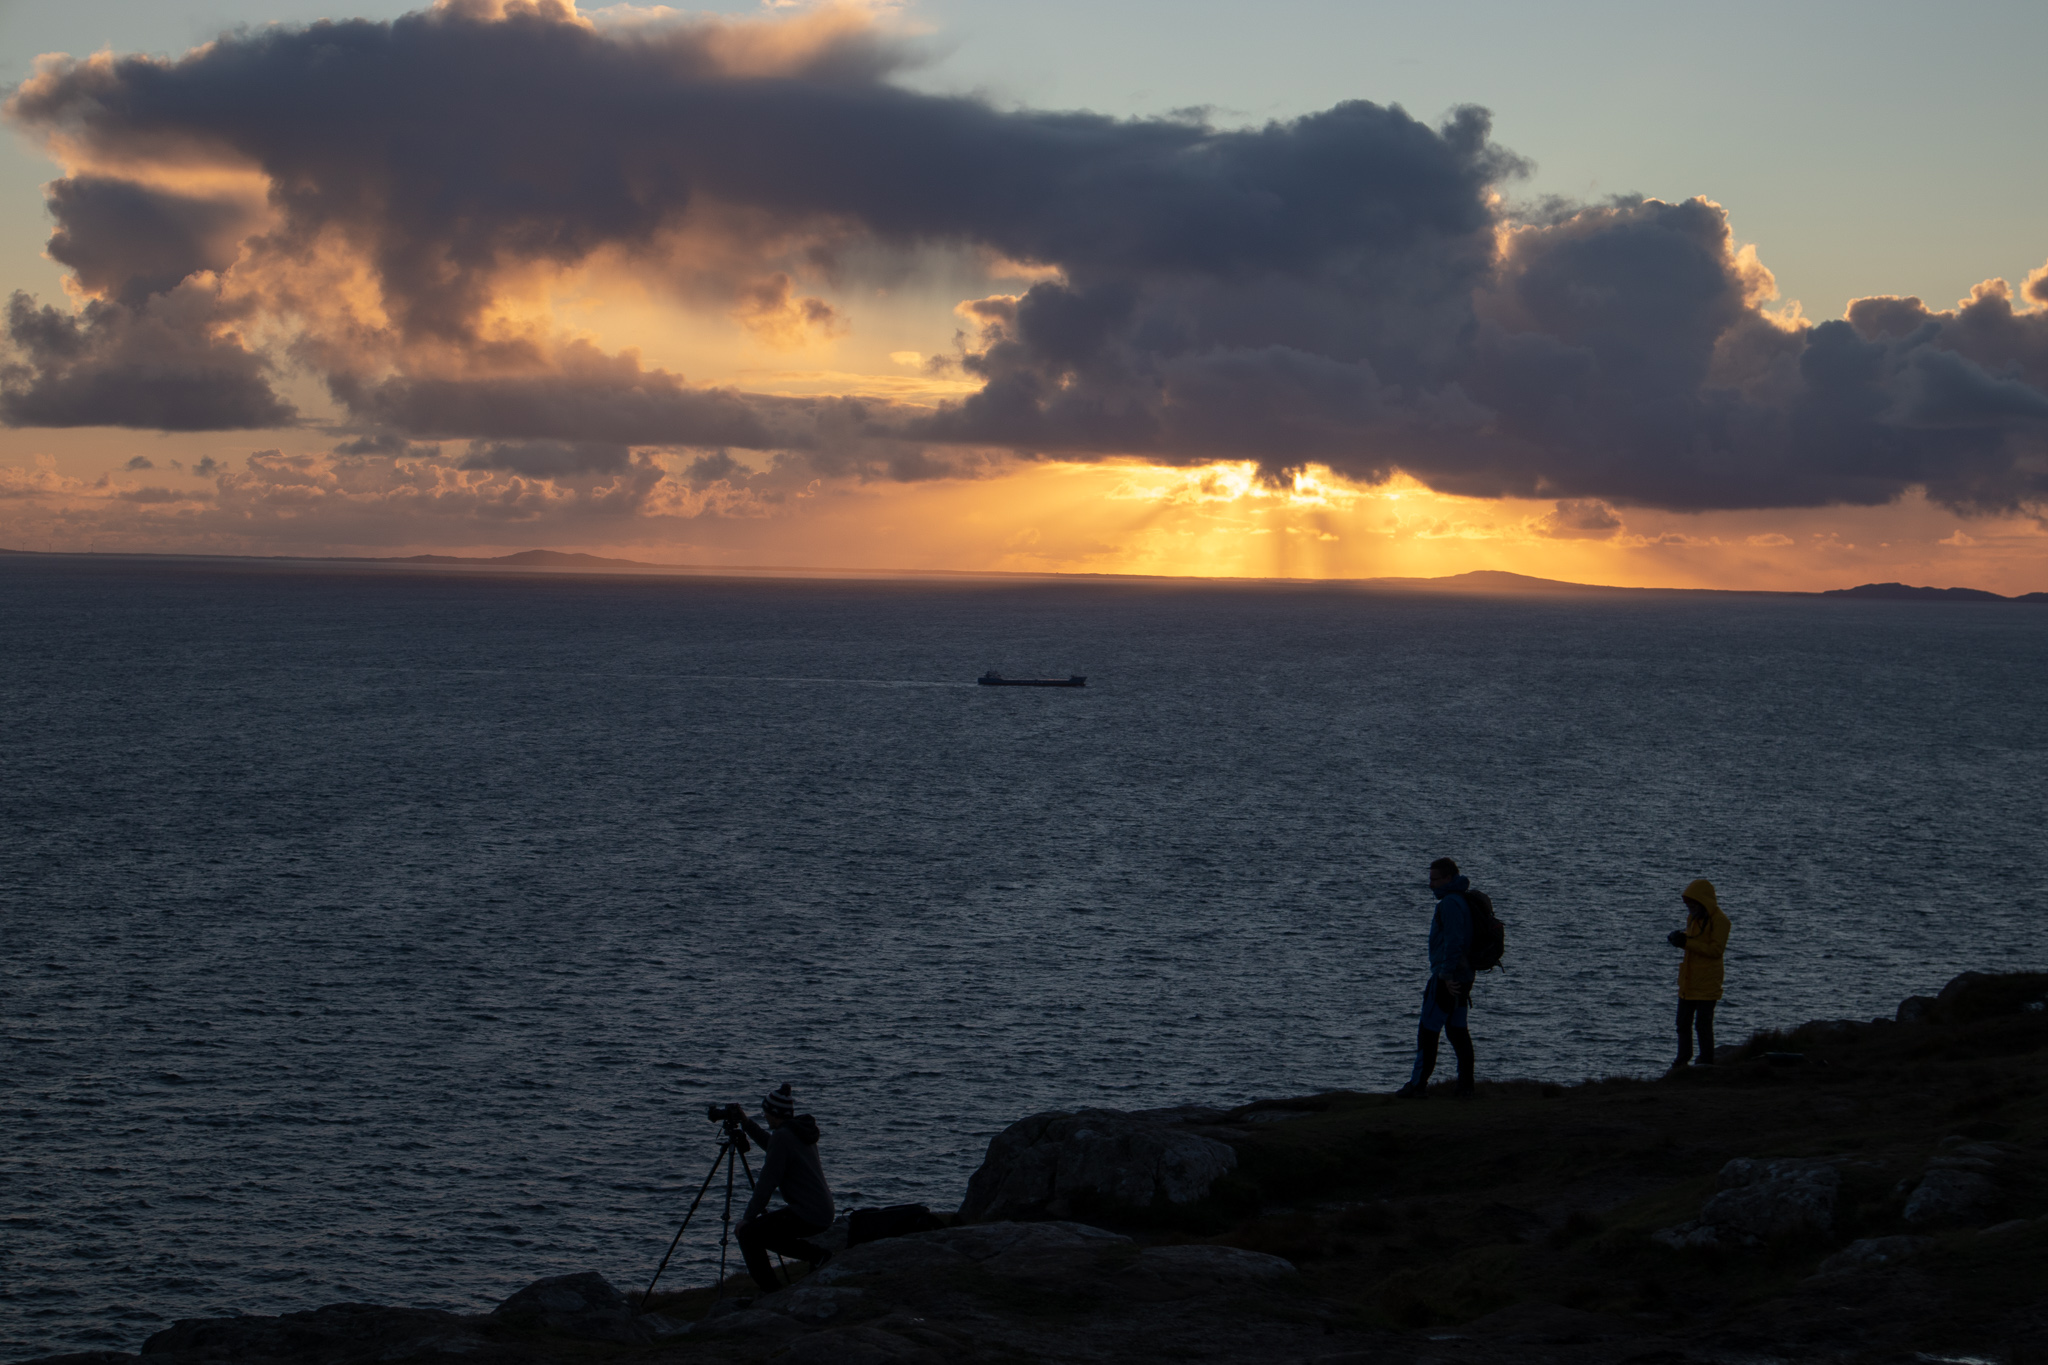 Neist Point. The westernmost point of Isle of Skye, Scotland. |MissFunctional Money | #travel #scotland #honeymoonideas